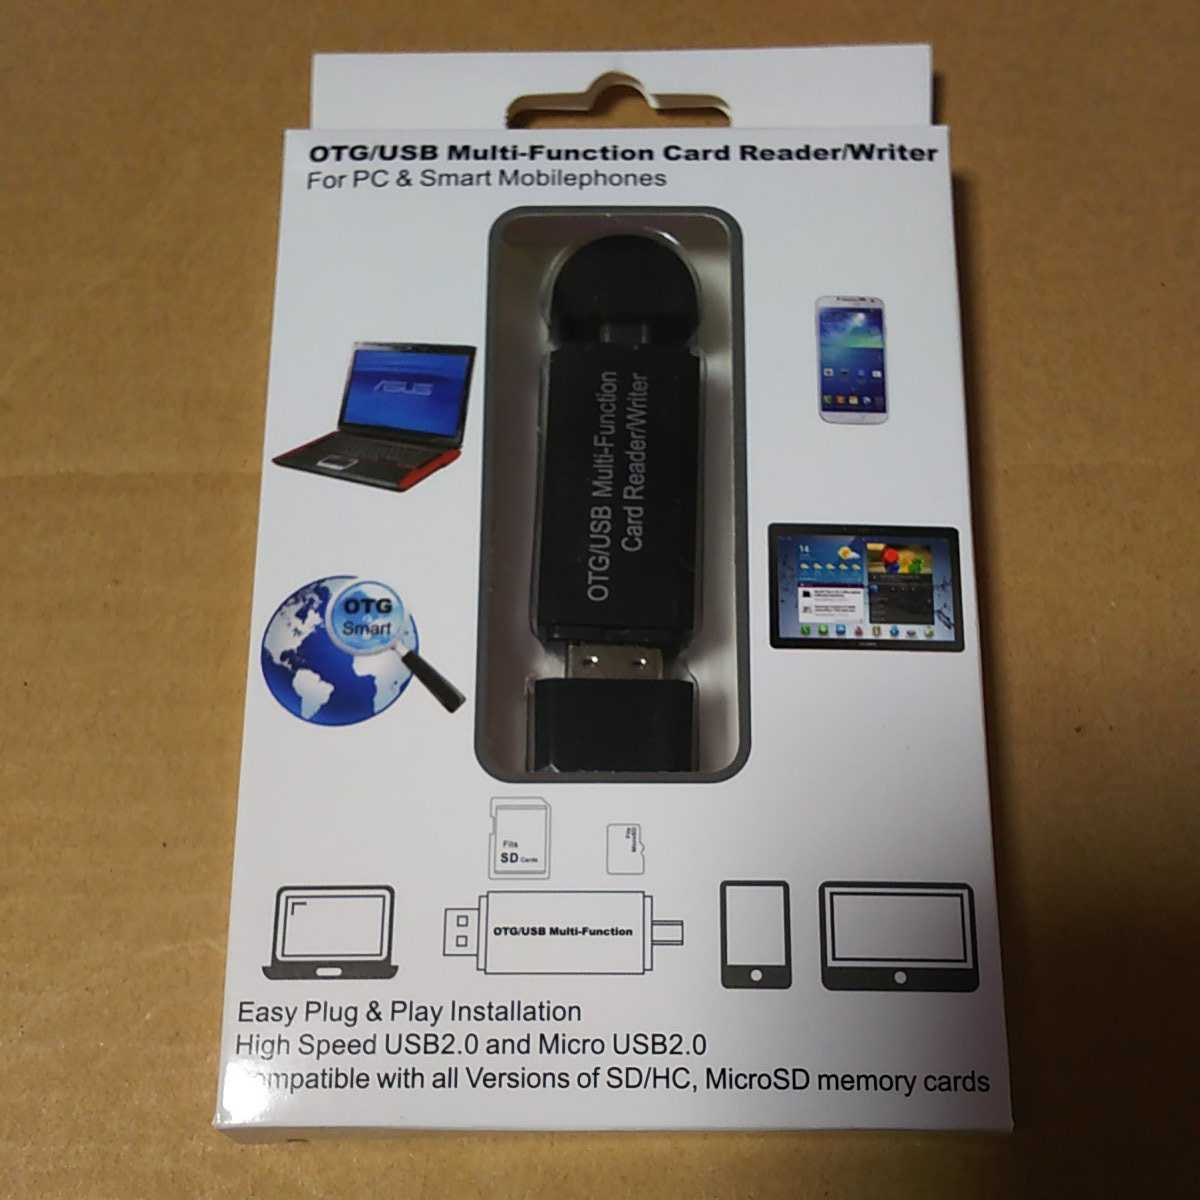 ◆SDカードリーダー USB メモリーカードリーダー MicroSD マルチカードリーダー ブラック